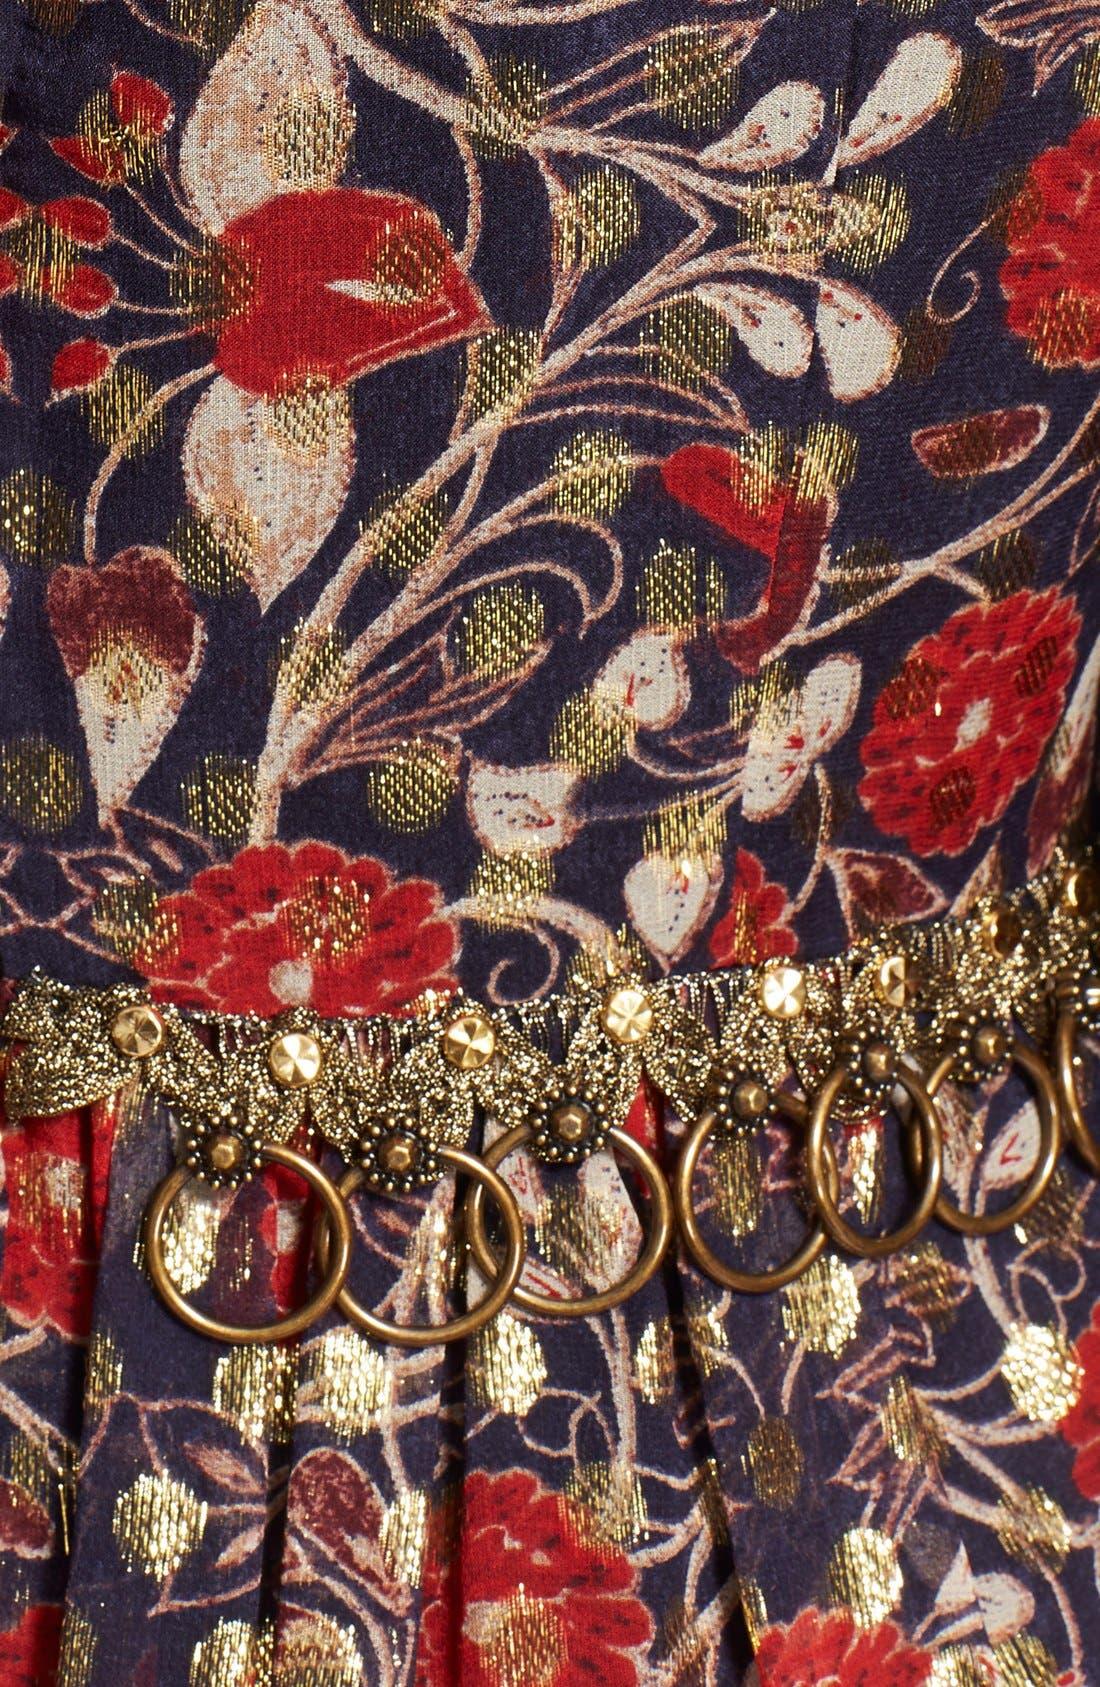 'Leane' Floral Print Embellished Gown,                             Alternate thumbnail 3, color,                             Arras